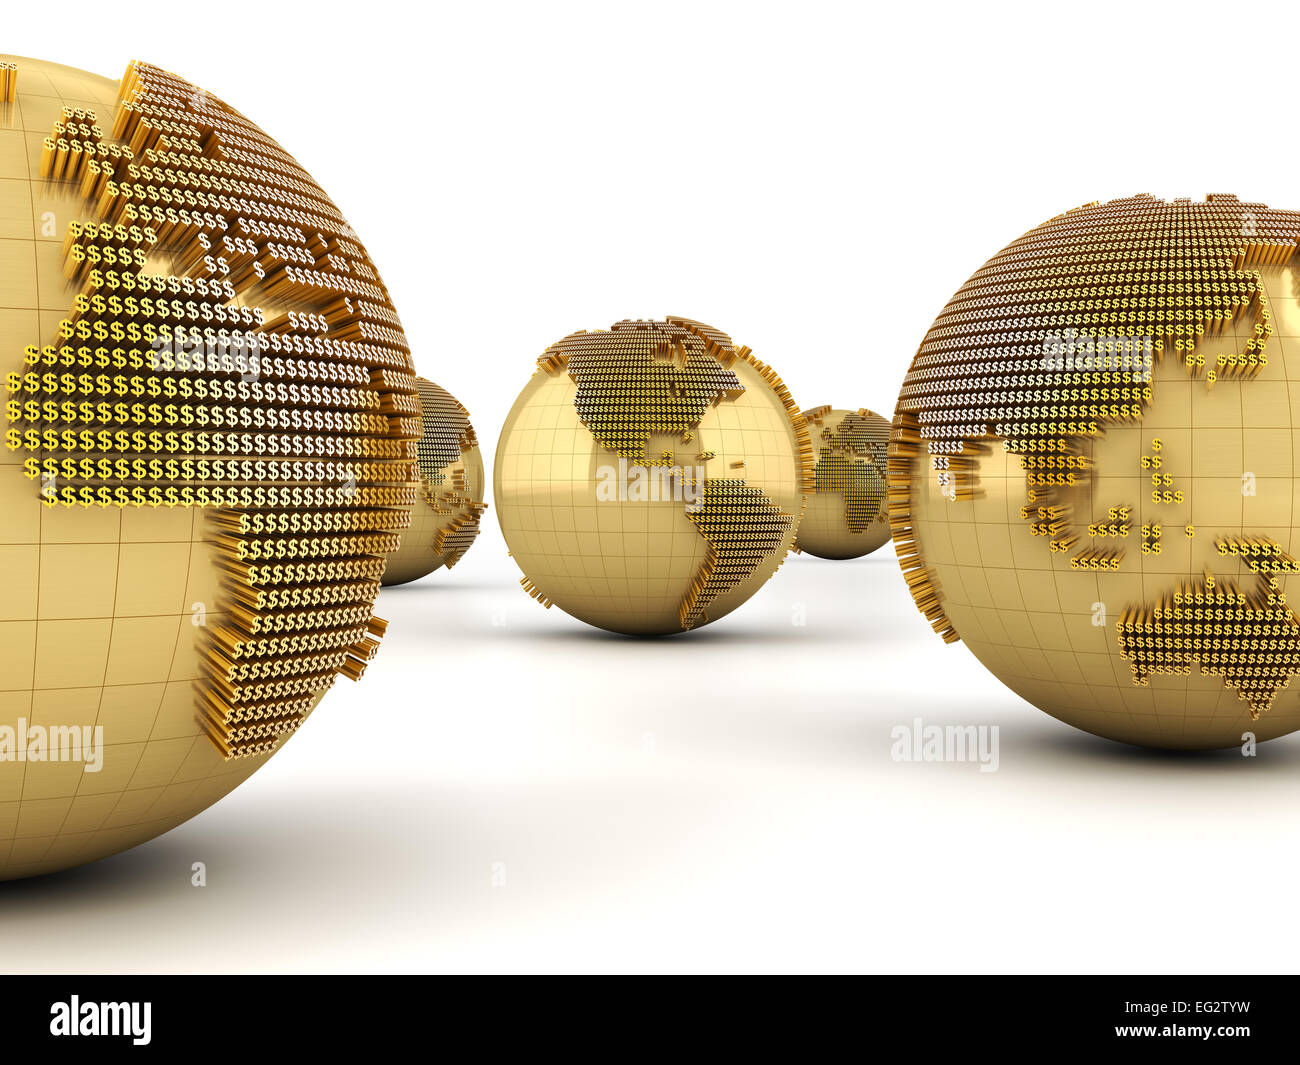 Geld-weltweit-Konzept Stockbild